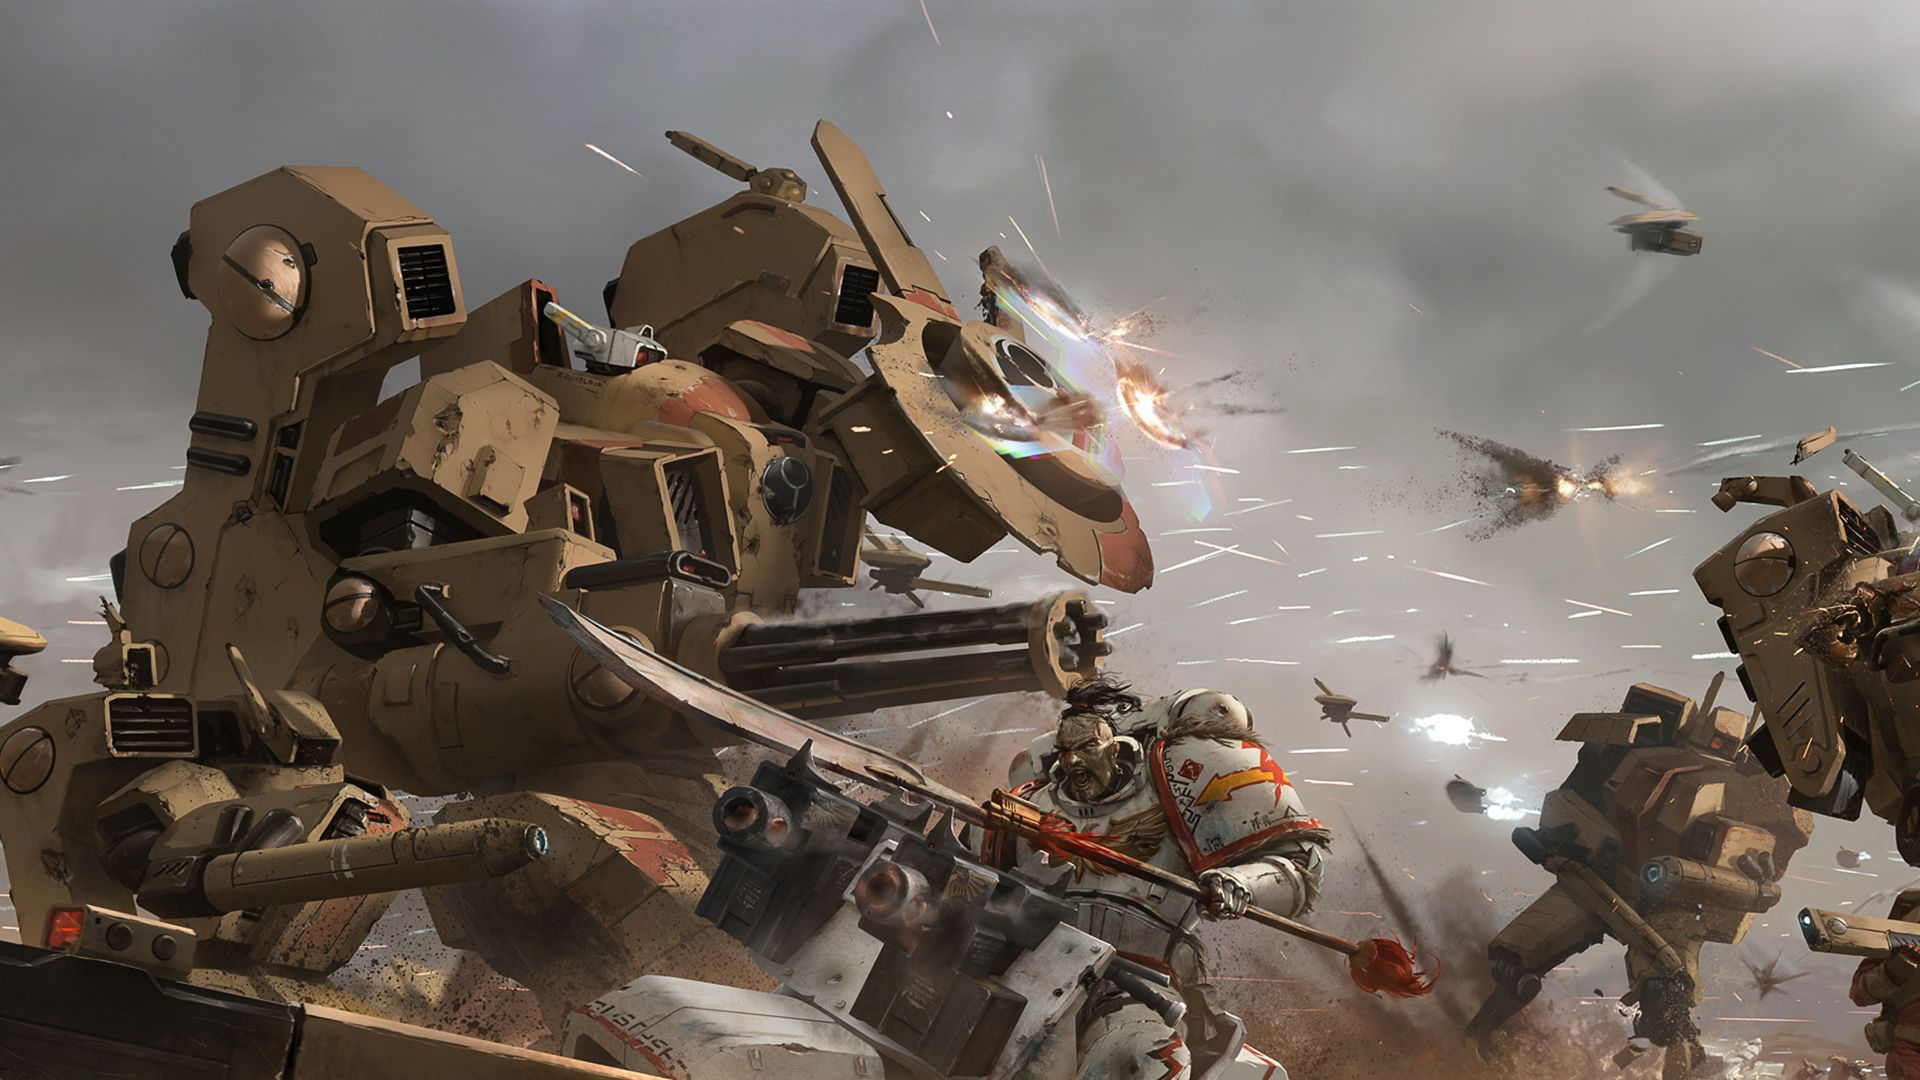 Warhammer 40k Wallpapers Top Free Warhammer 40k Backgrounds Wallpaperaccess